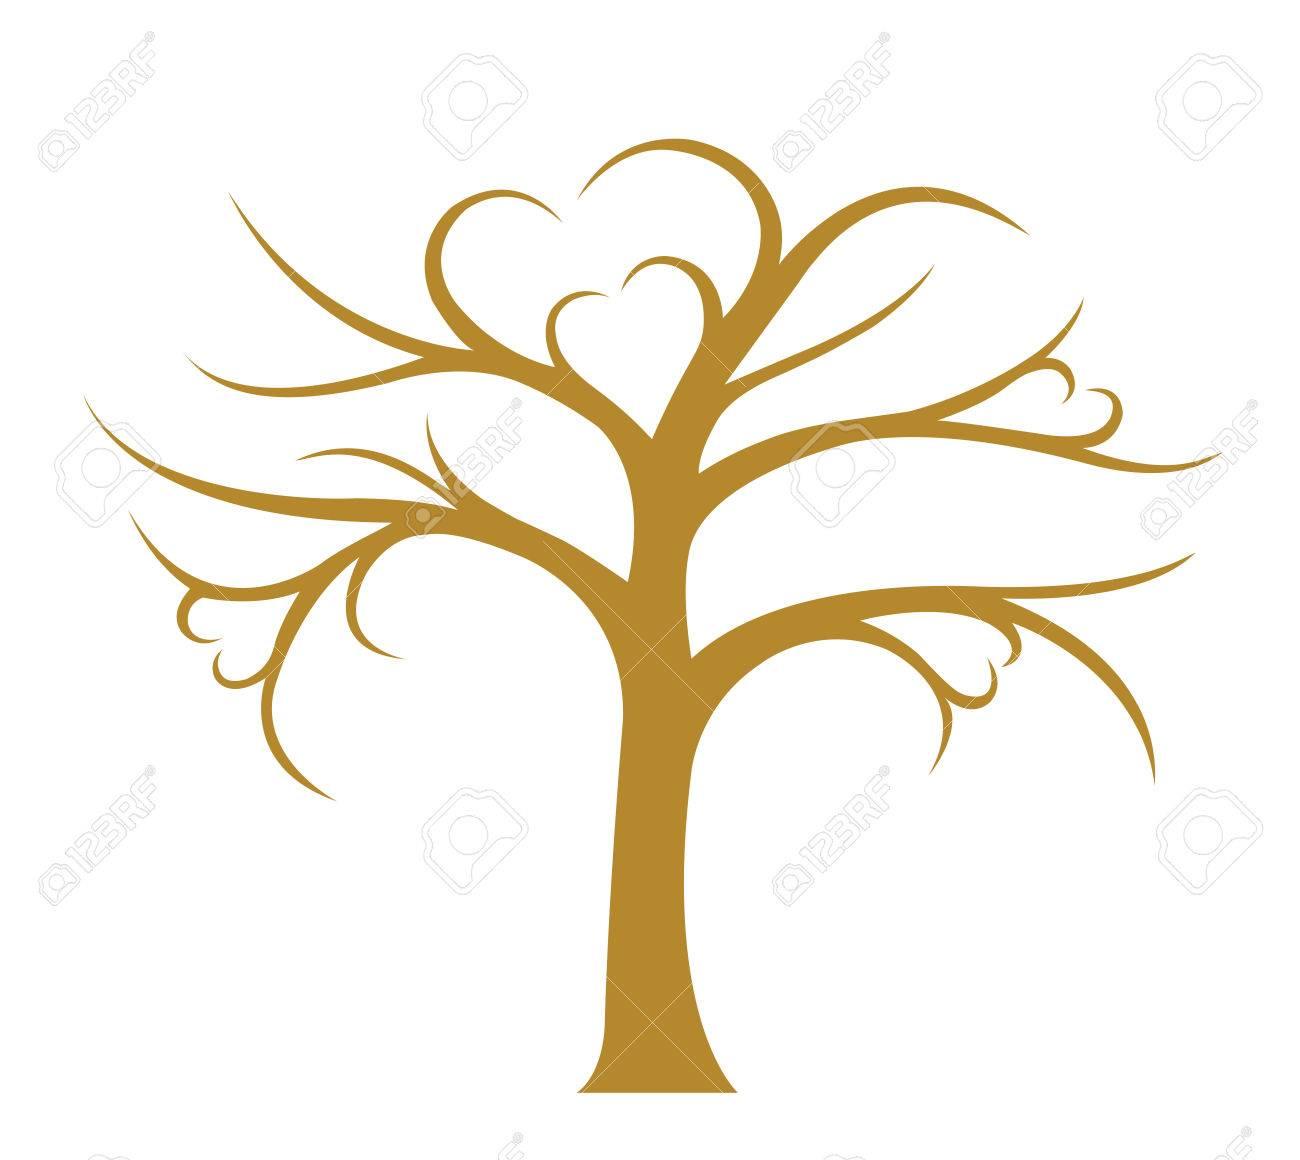 Tree - 31916511